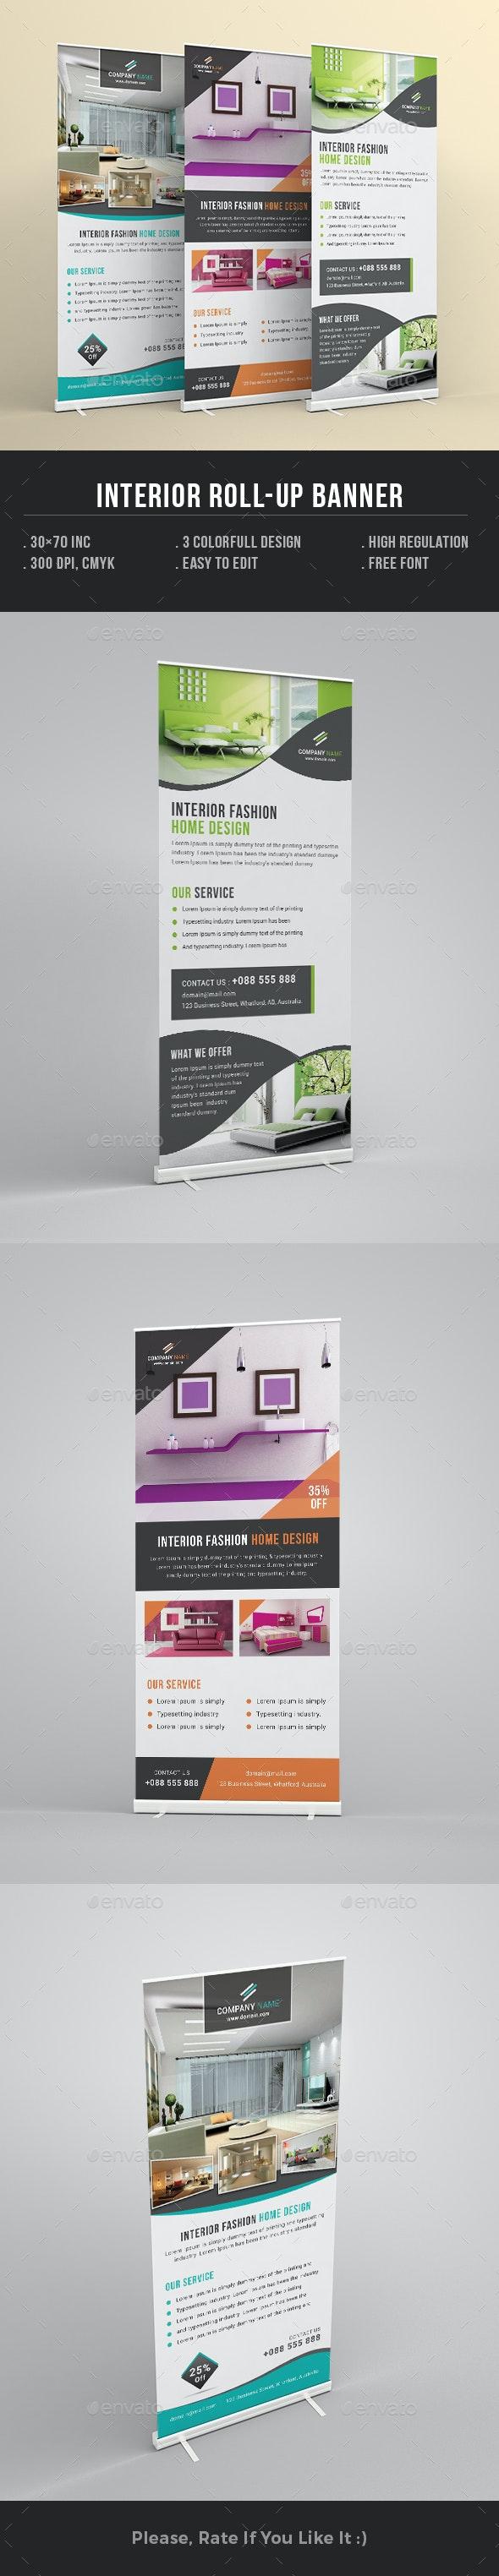 Interior Design Rollup Banner - Signage Print Templates